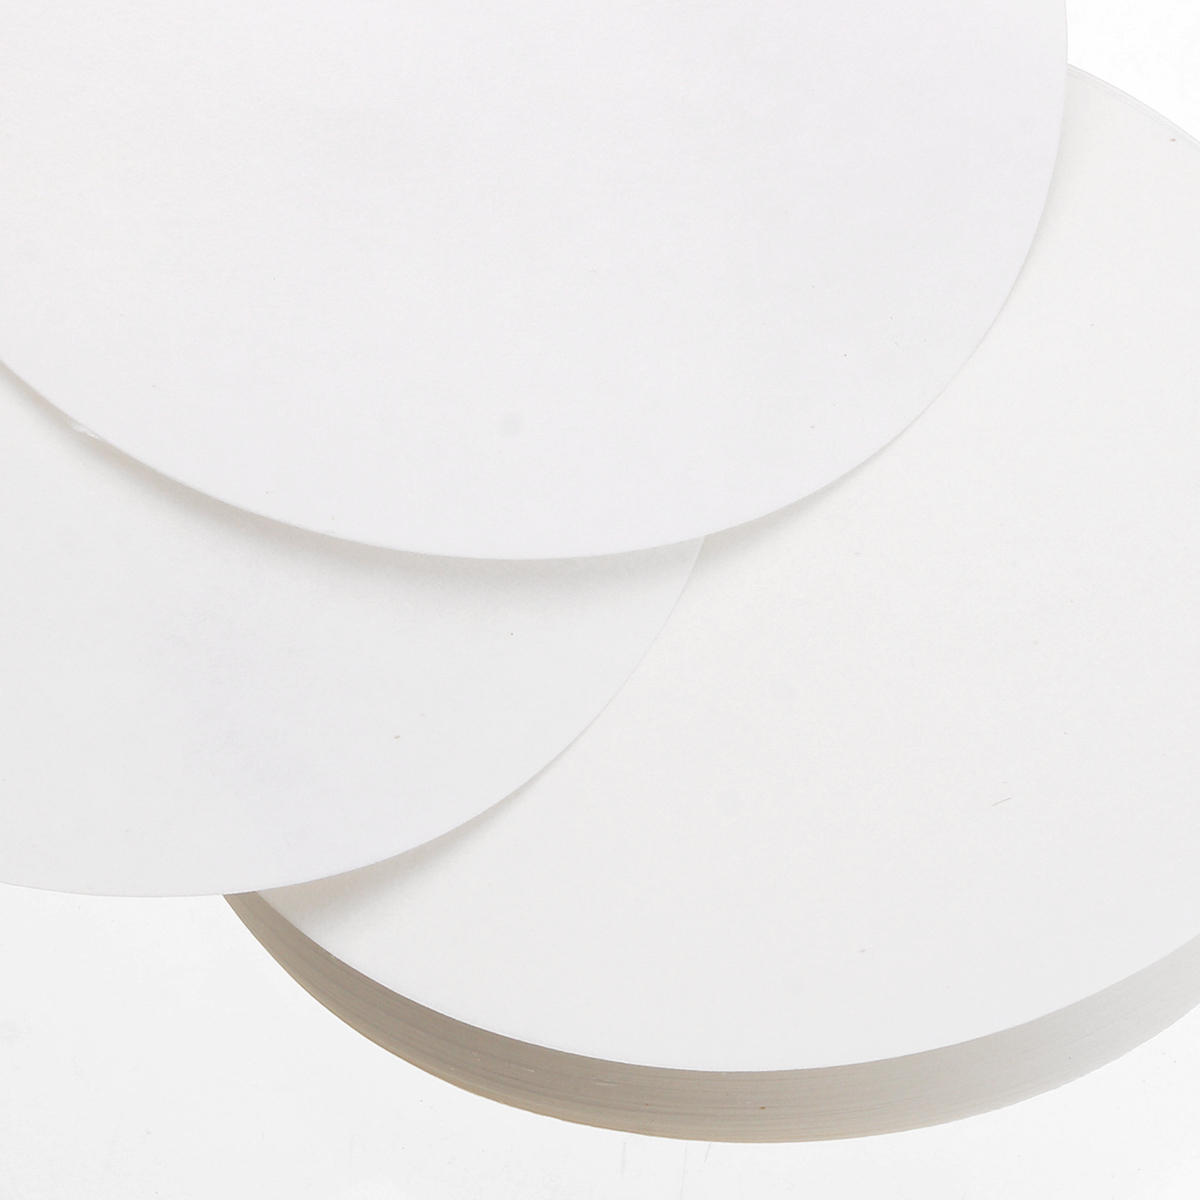 100Pcs/Set 7/9/11/12.5/15/18cm Quantitative Filter Paper Ashless Circular Funnel Filter Sheet Slow Speed 10-15um